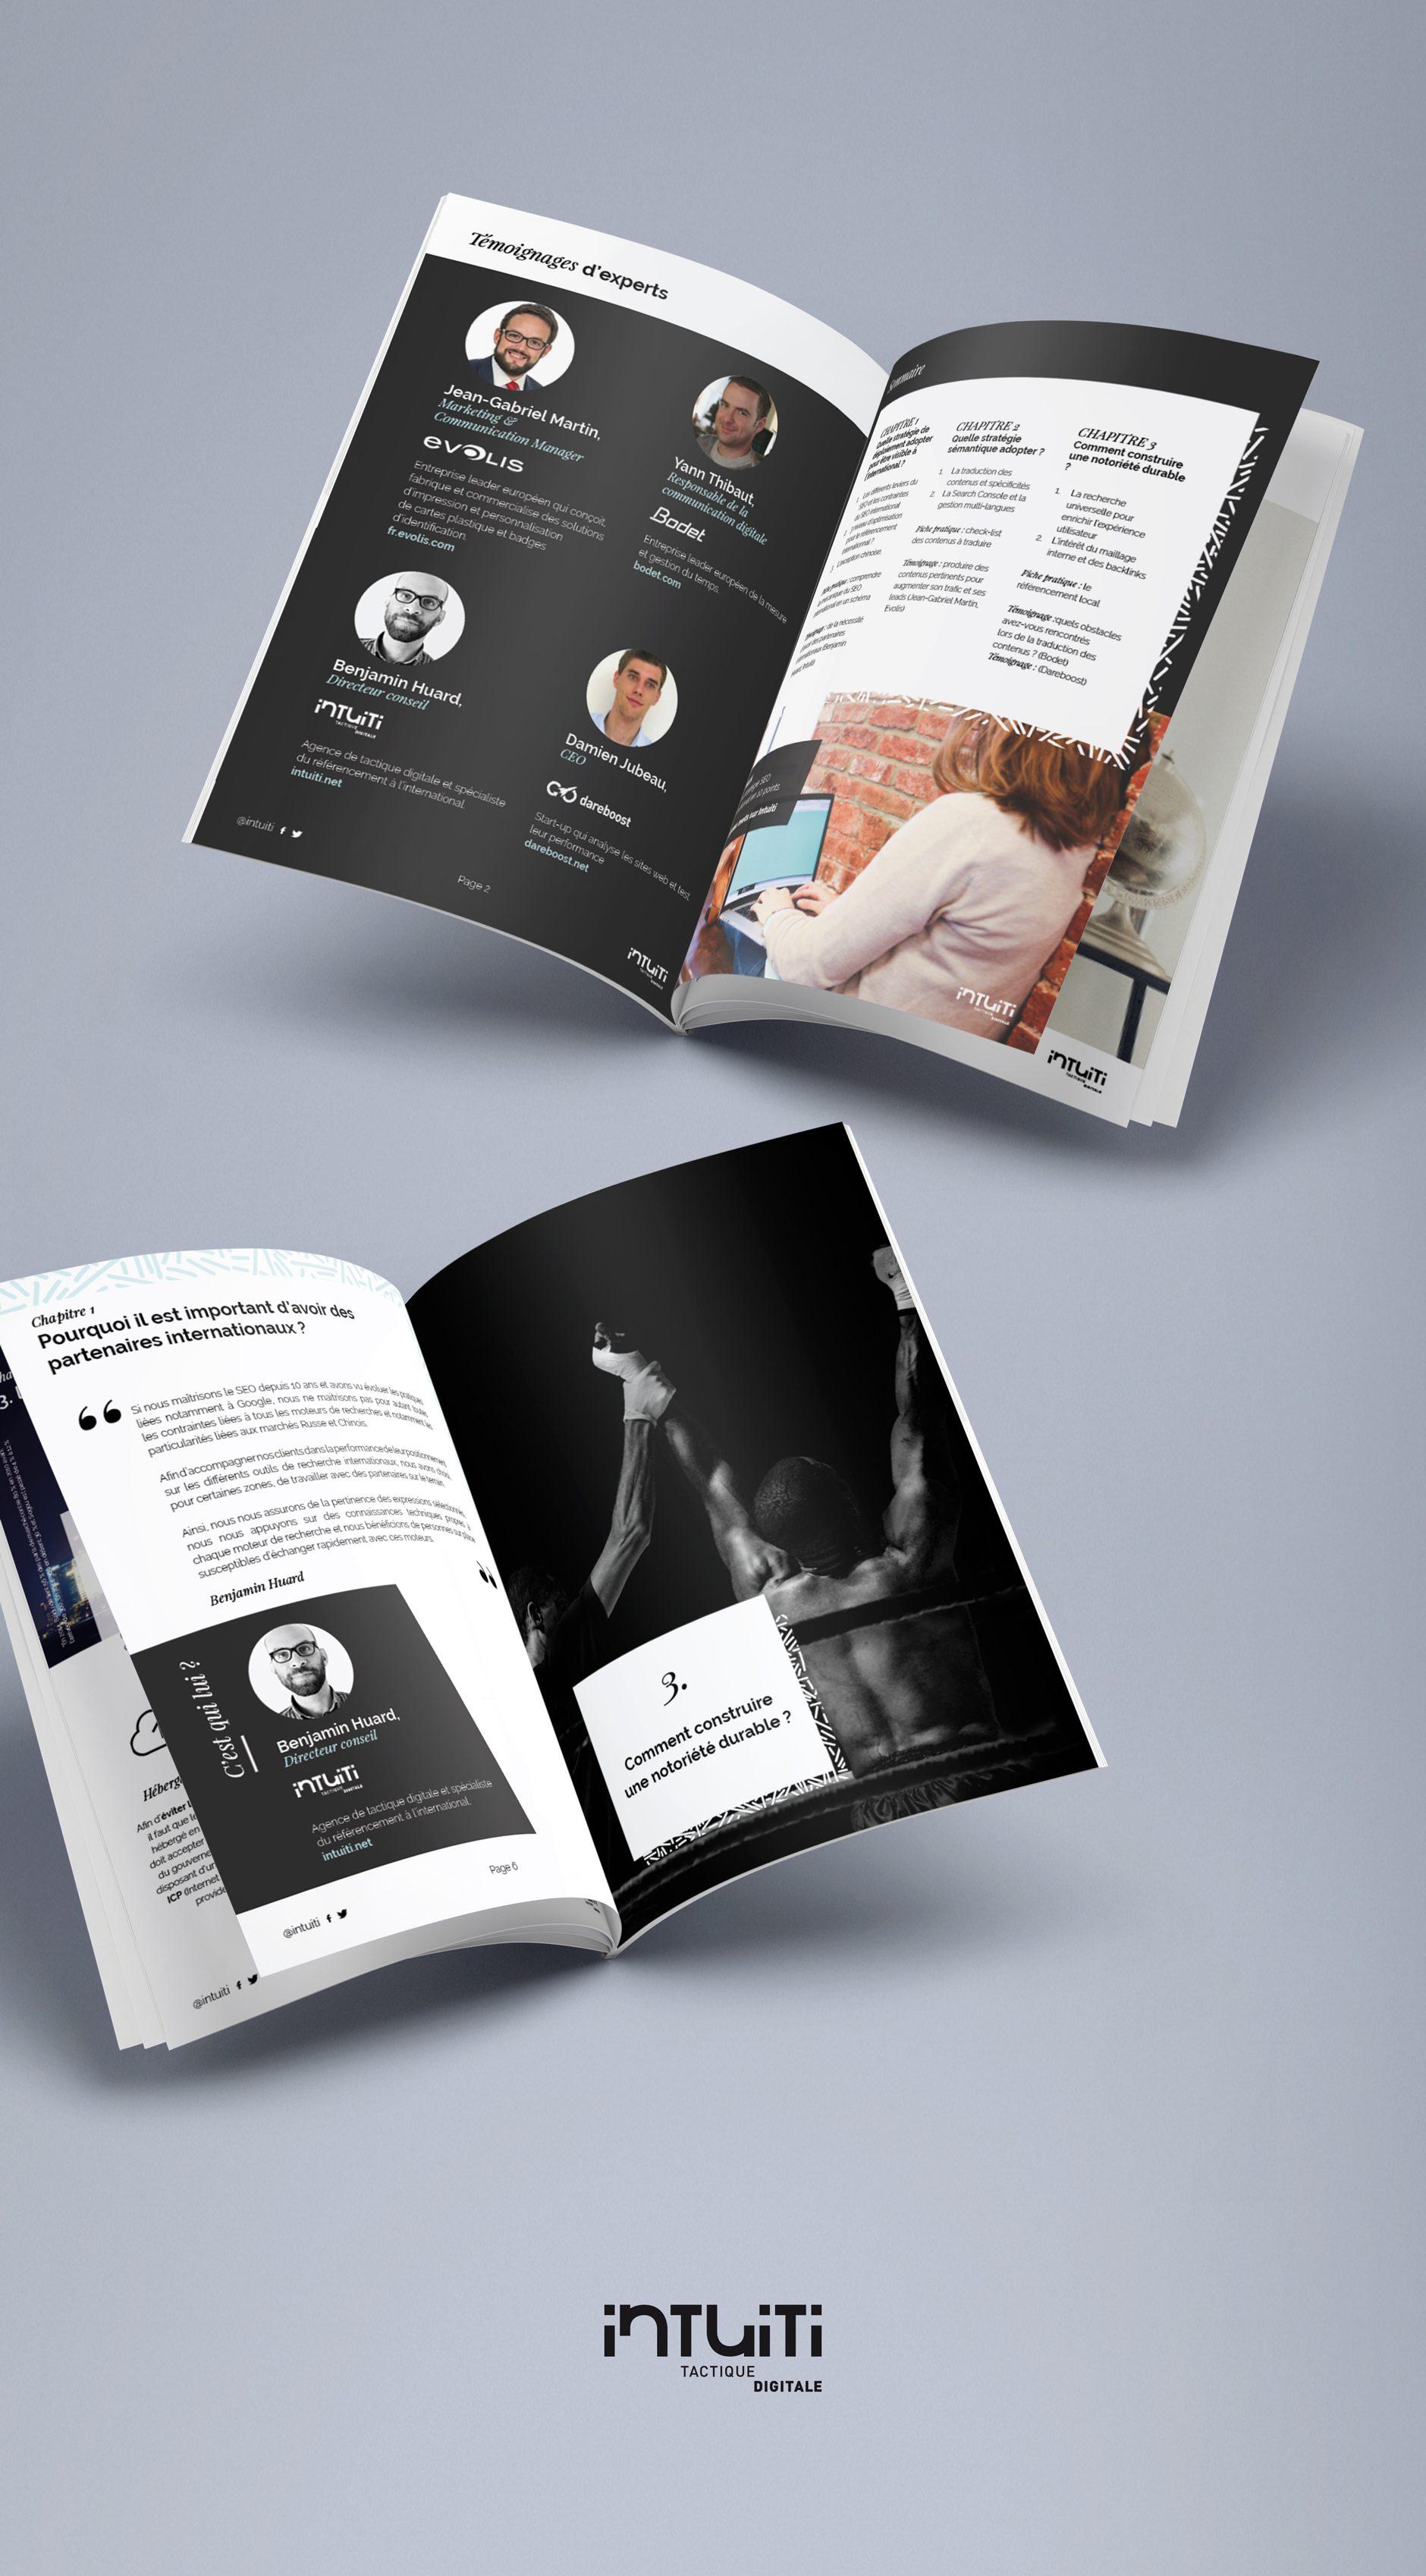 Intuiti : Livre Blanc